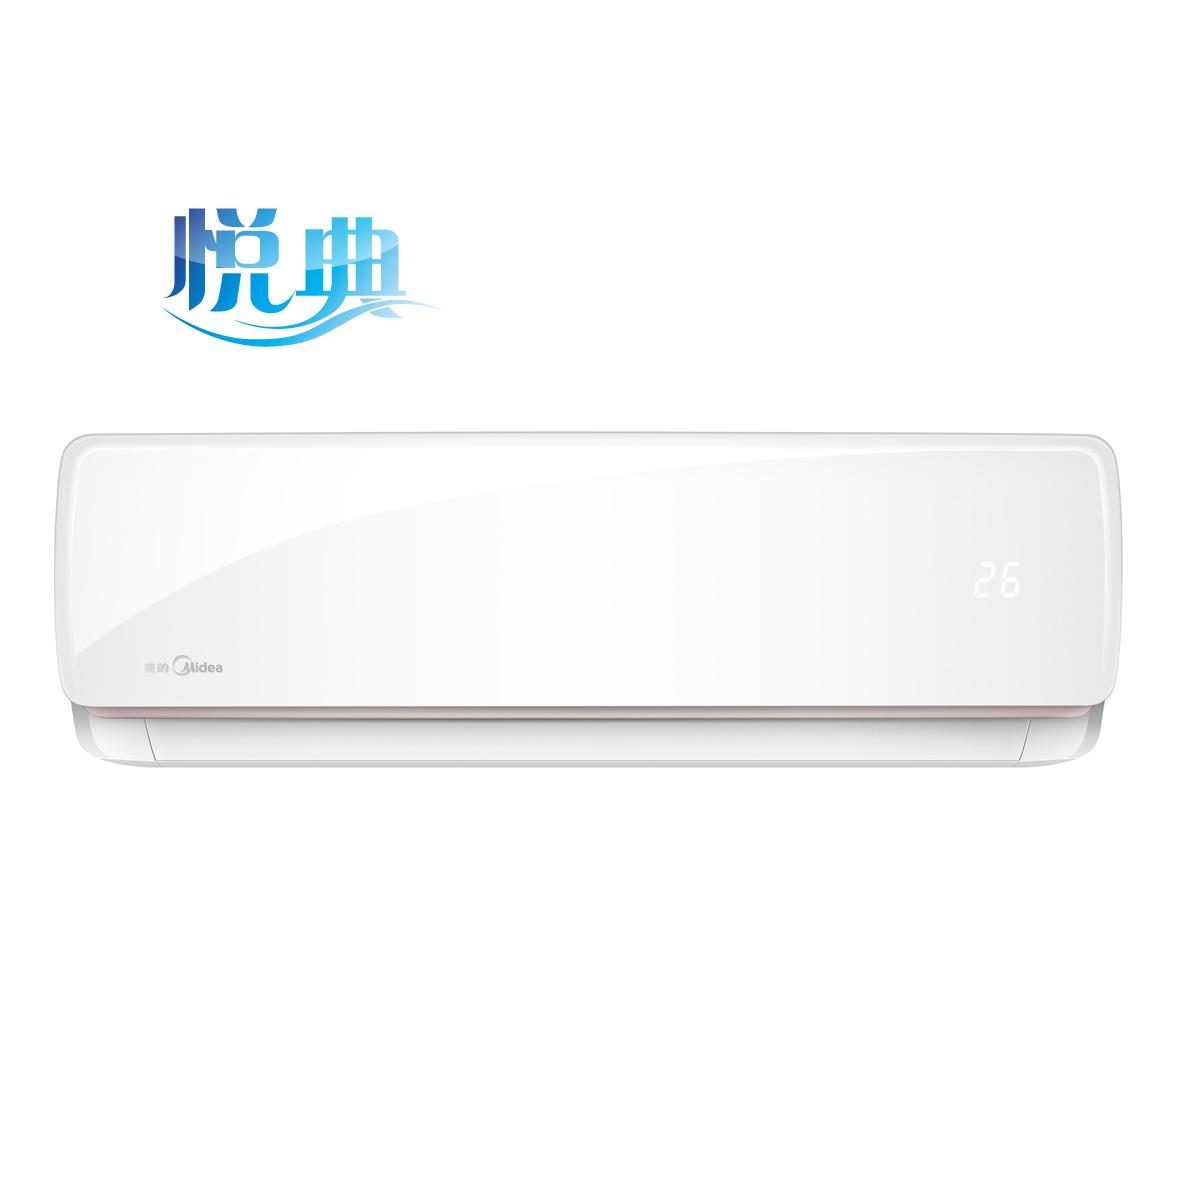 Midea/美的 KFR-23GW/DY-HB400(D3) 家用空调套机 说明书.pdf